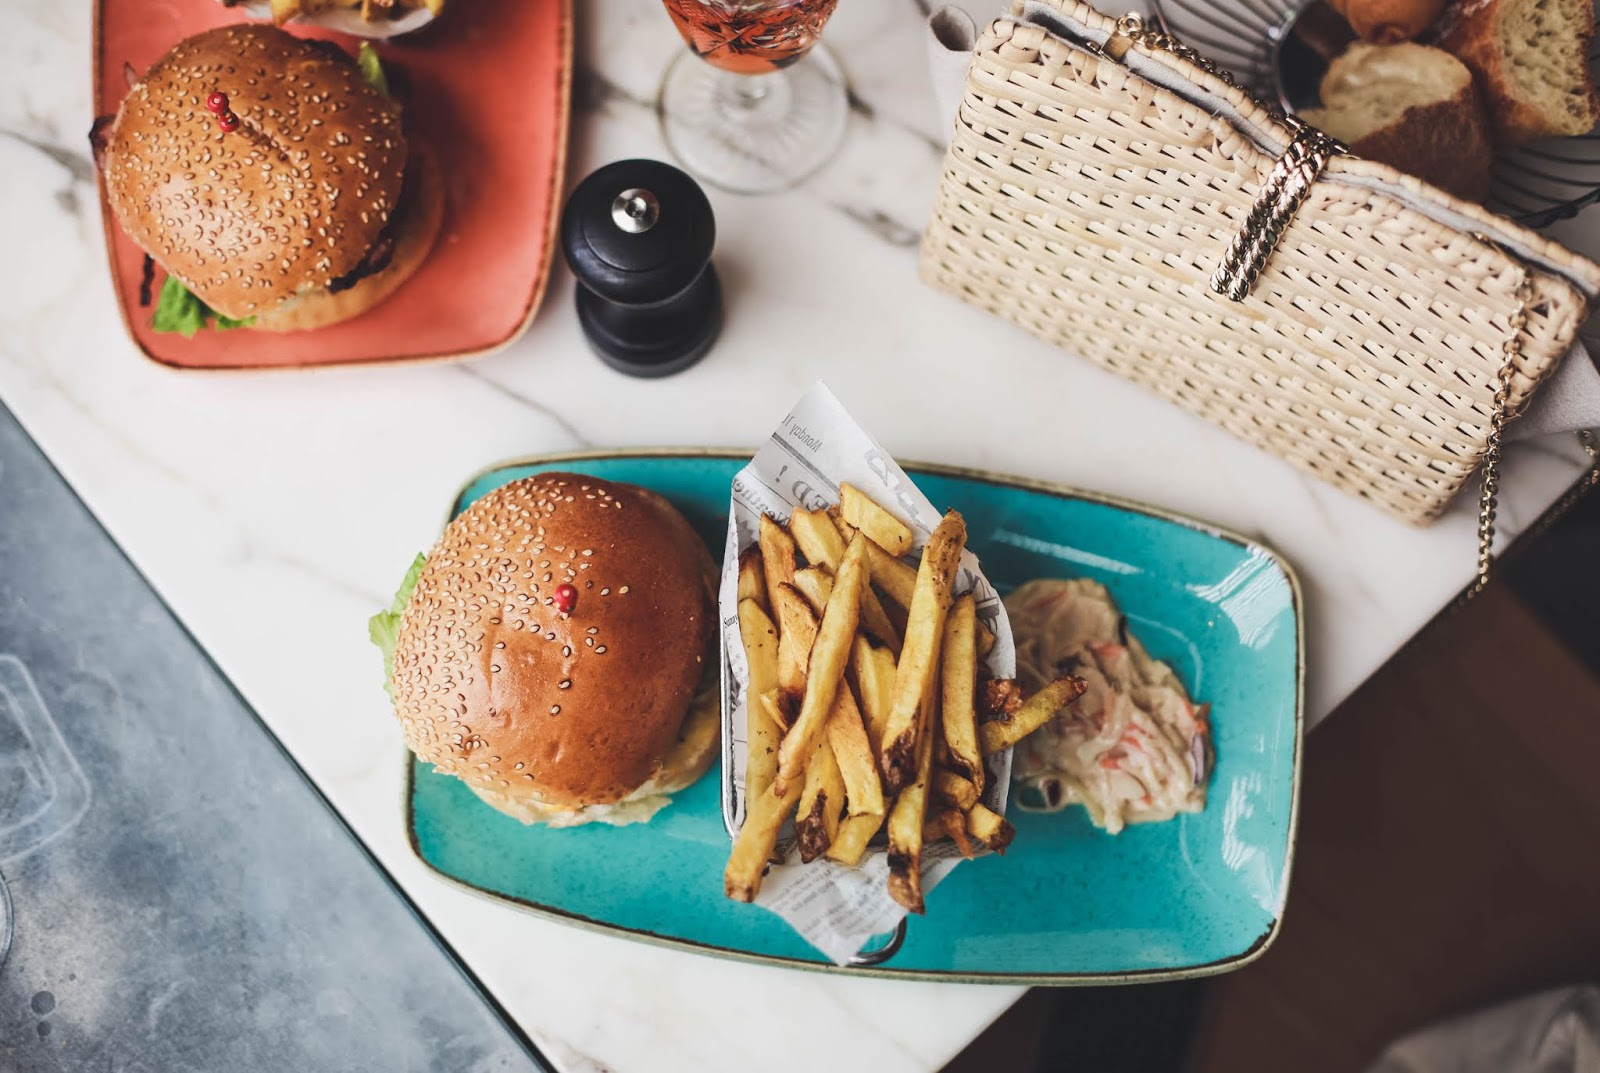 paris meilleurs restaurants